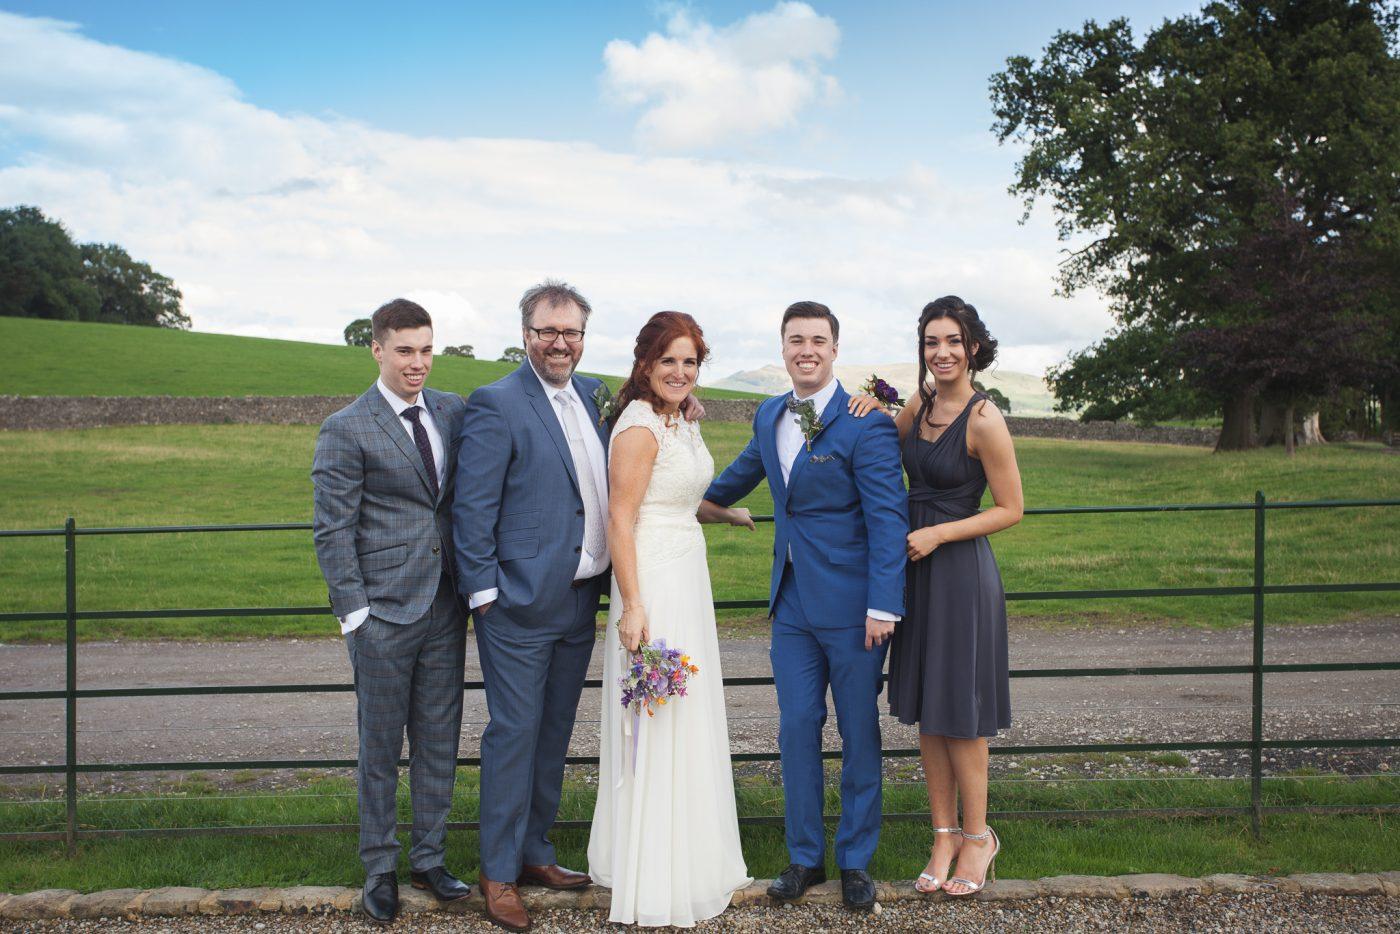 Eden Broughton Hall wedding photographer